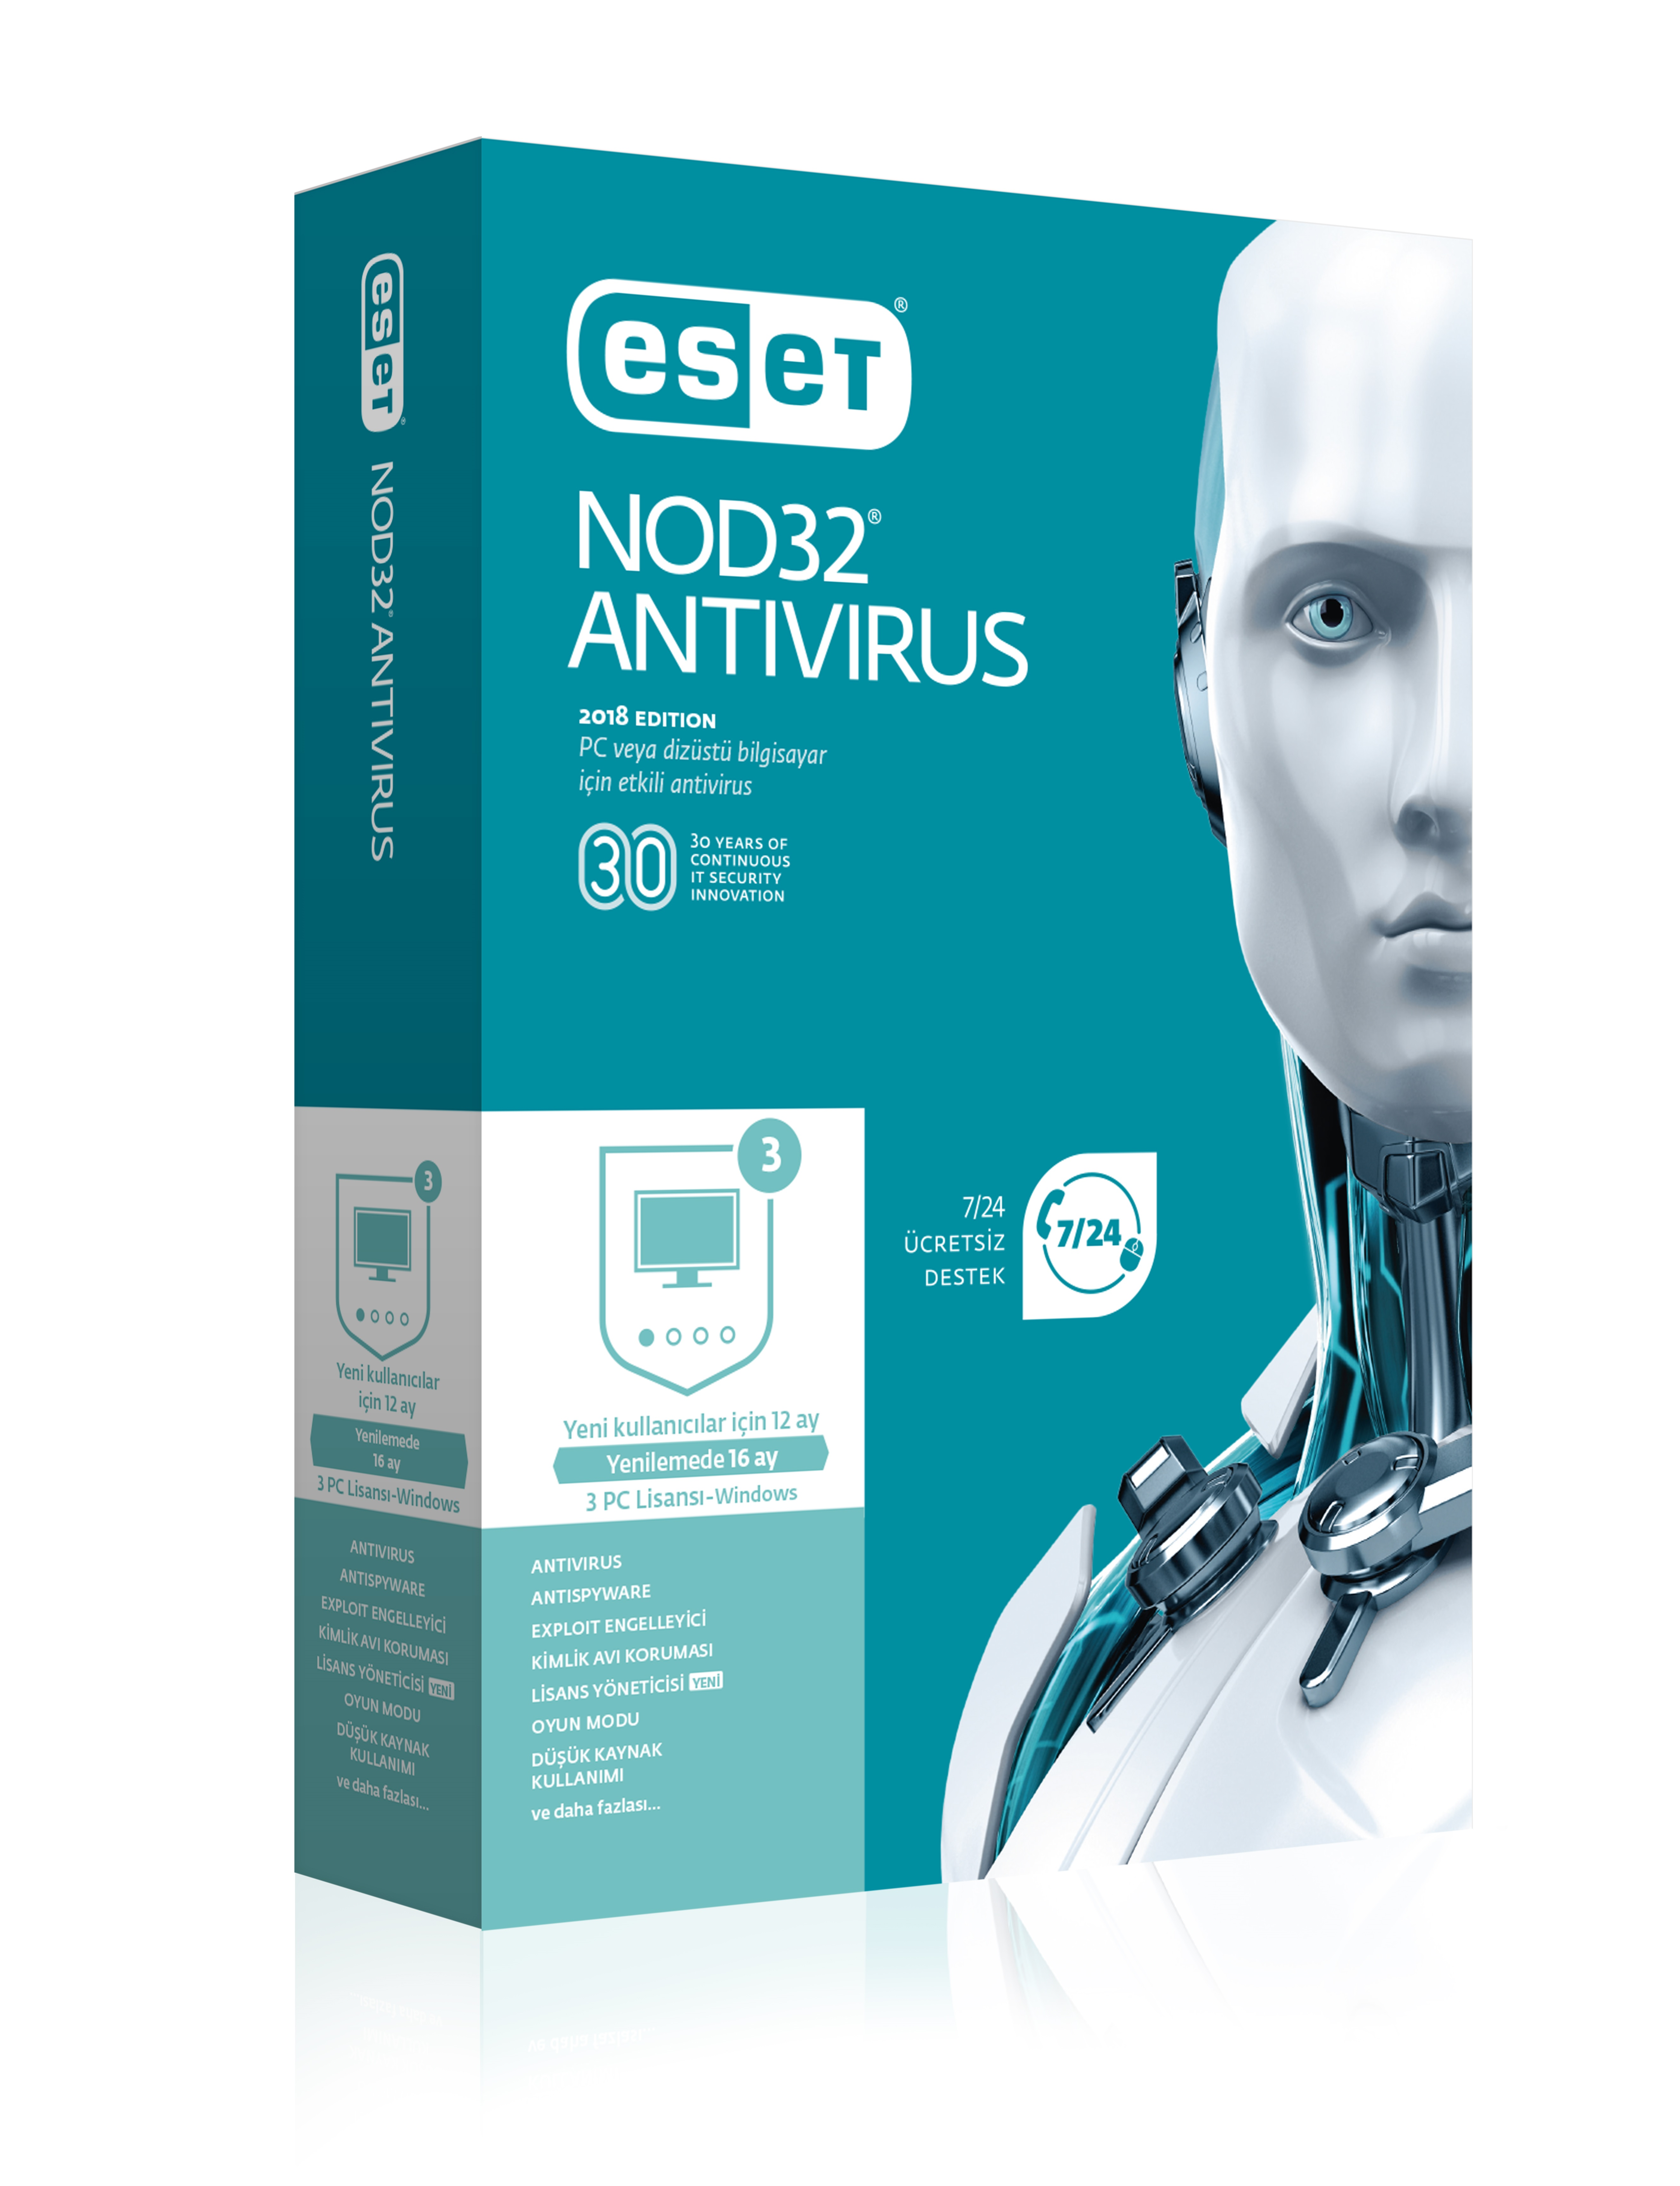 NOD32 ESET ANTIVIRUS V10 TURKCE KUTU 3 KULLANICI